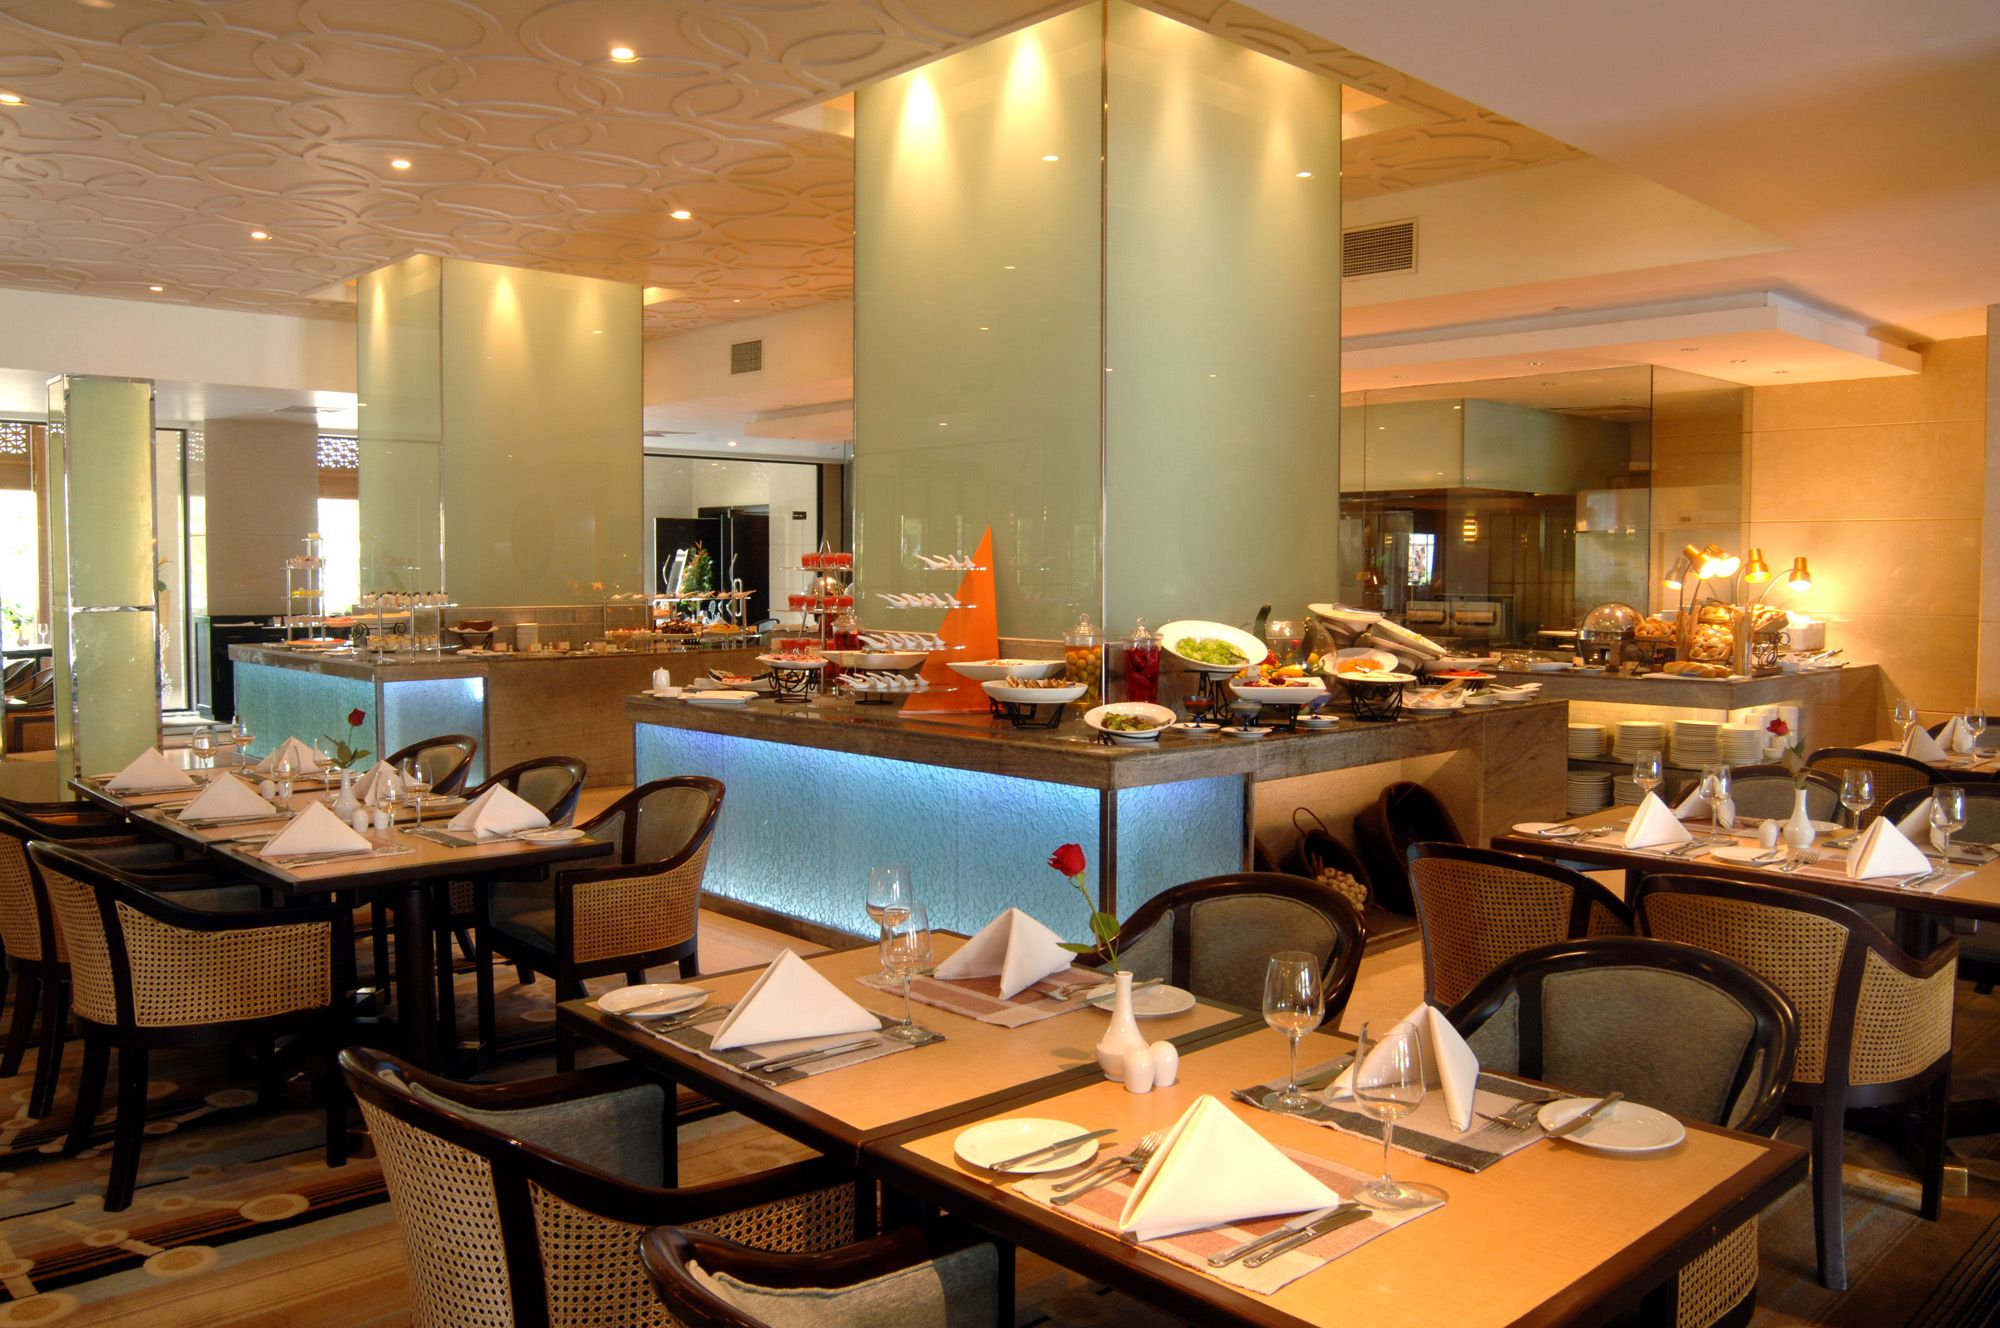 Dining Room Restaurant At 5 Star Hotel: Cinnamon Lakeside Hotel. This  Hotelu0027s Address Is: 115 Sir Chittampalam, A.Gardiner Mawatha Colombo World  Trade ...